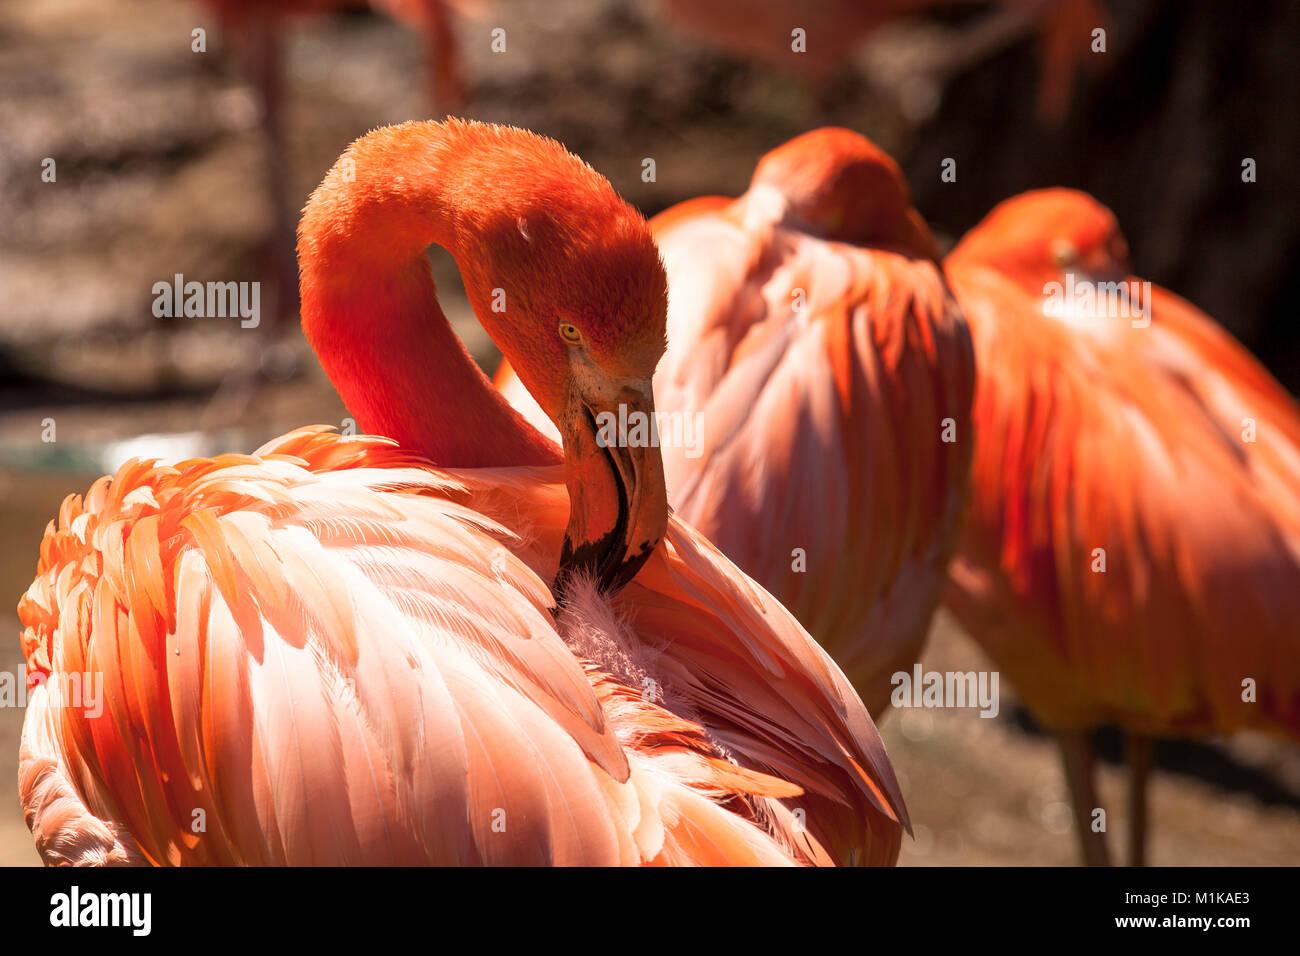 Germany, Cologne, the zoological garden, flamingo.  Deutschland, Koeln, im Zoo, Flamingos. - Stock Image